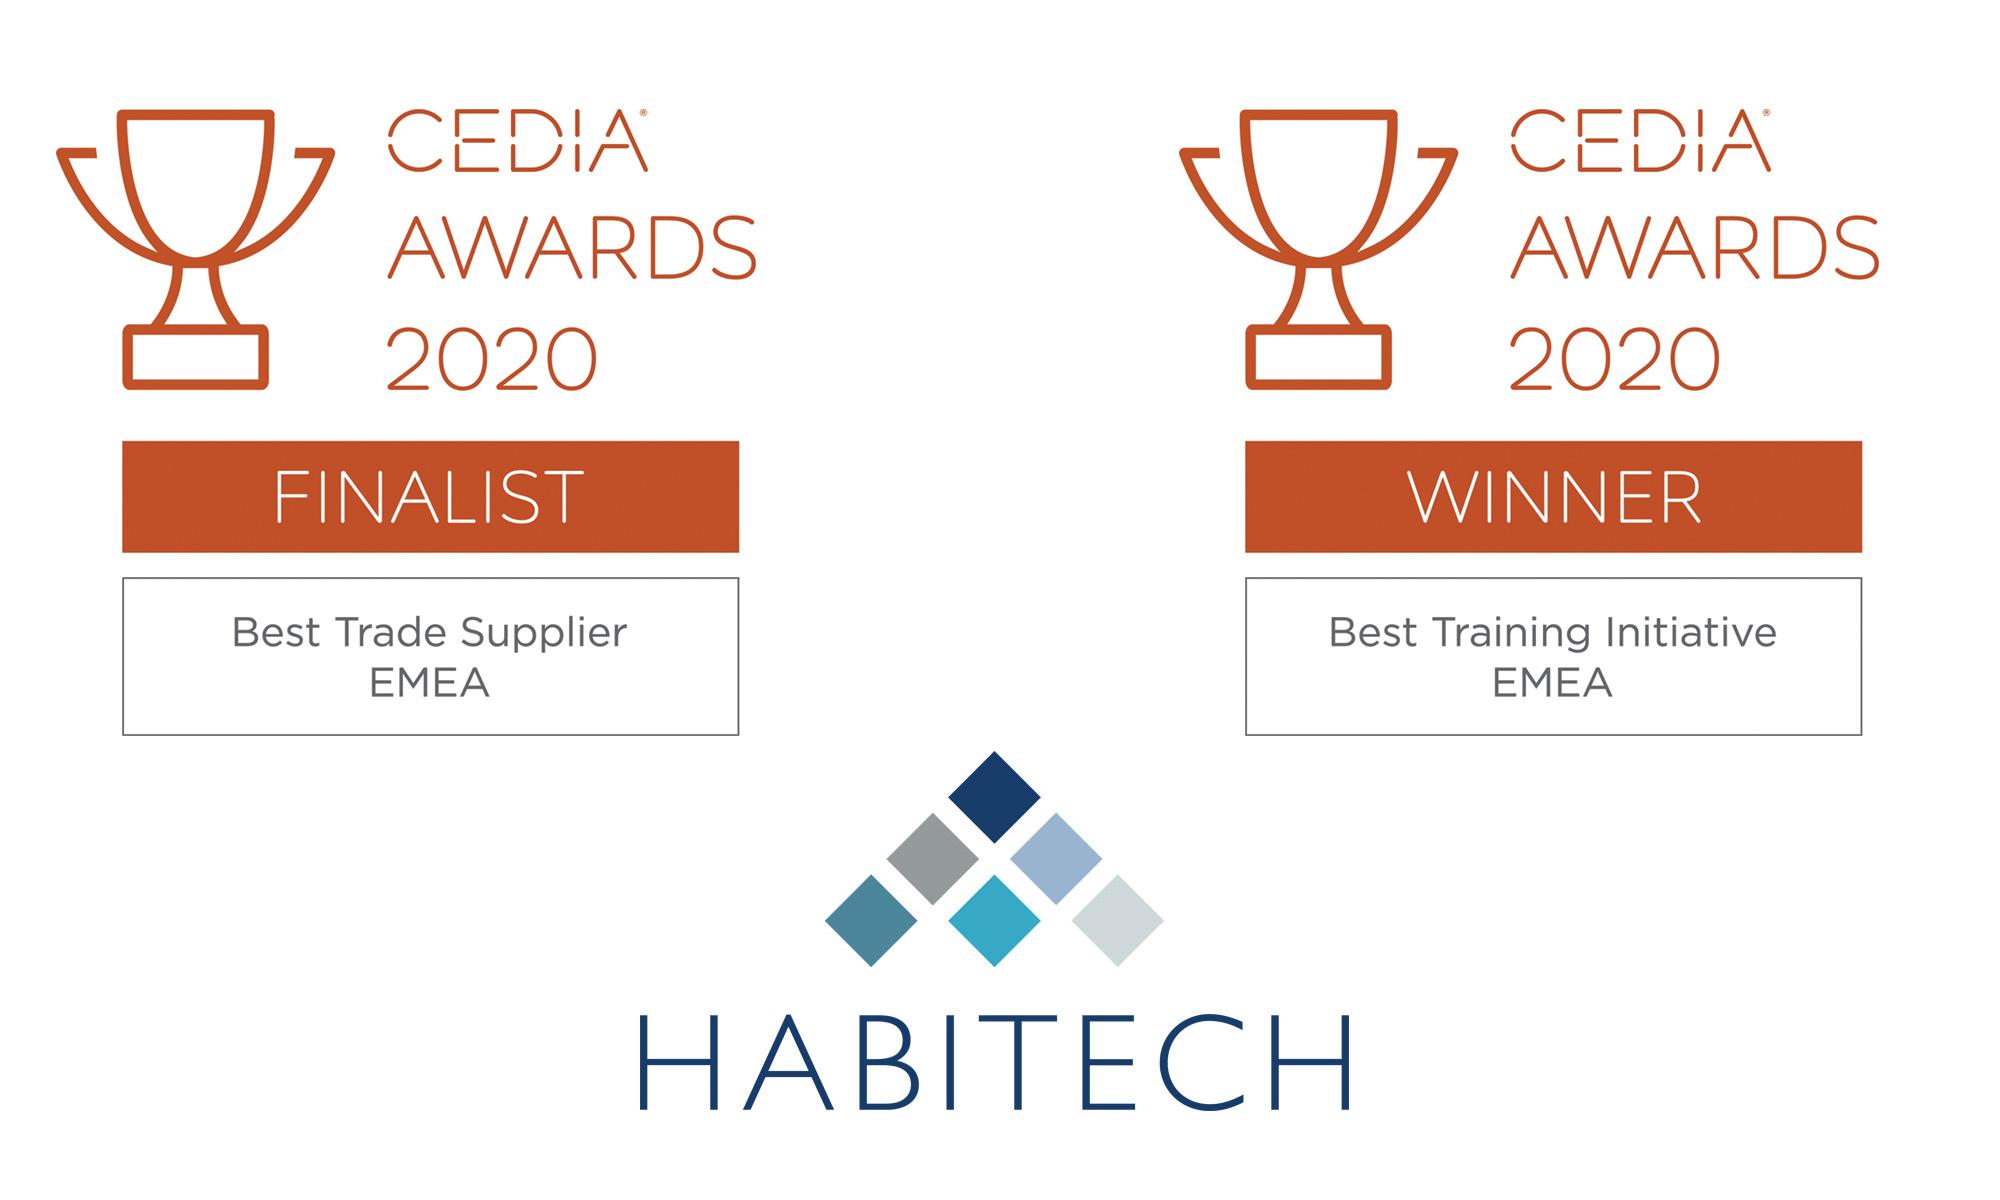 CEDIA Award